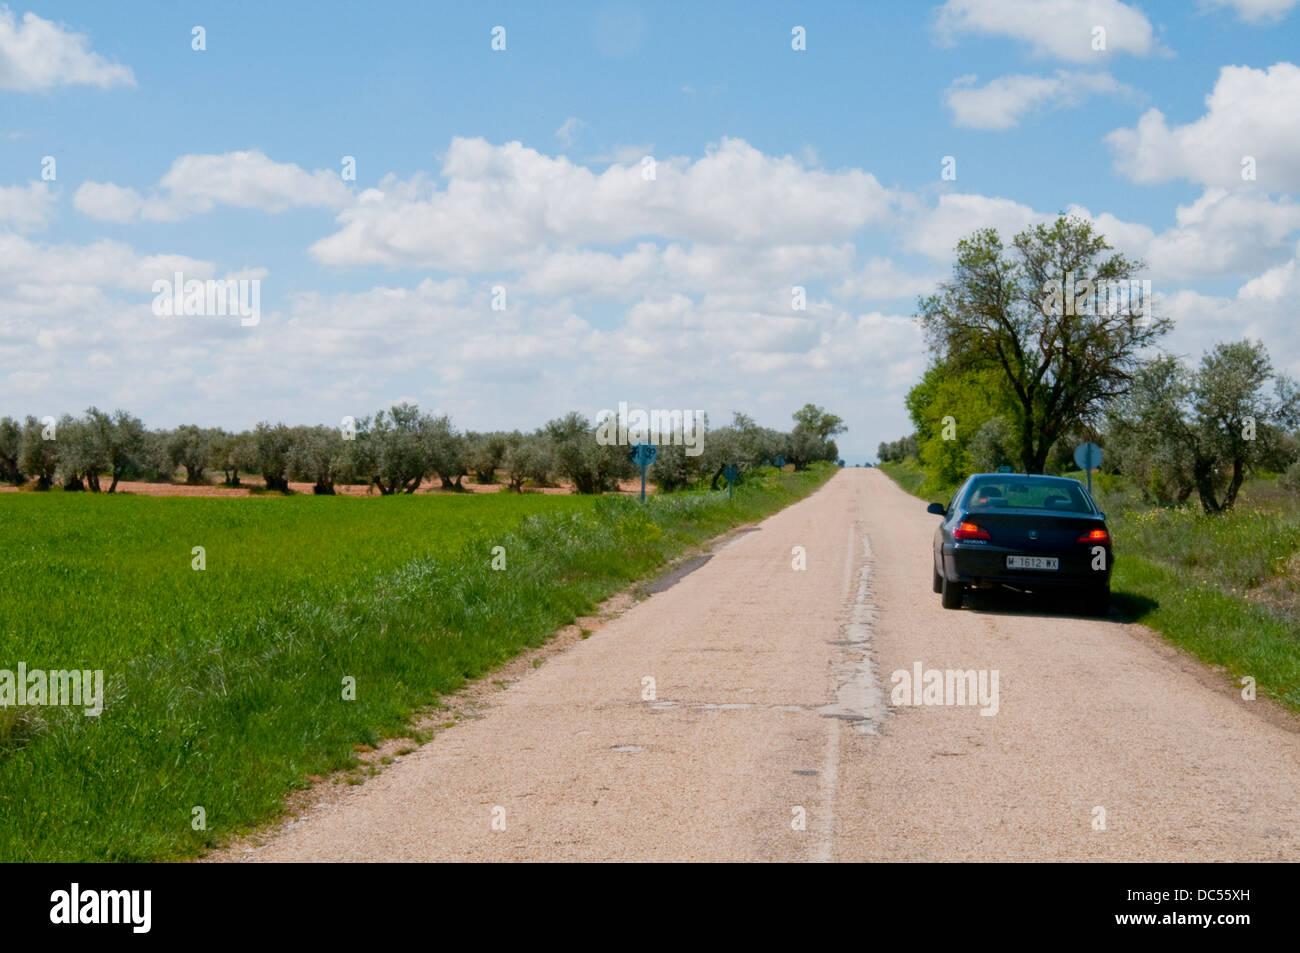 Stopped car on a side road, emergency lights on. Toledo province, Castilla La Mancha, Spain. - Stock Image